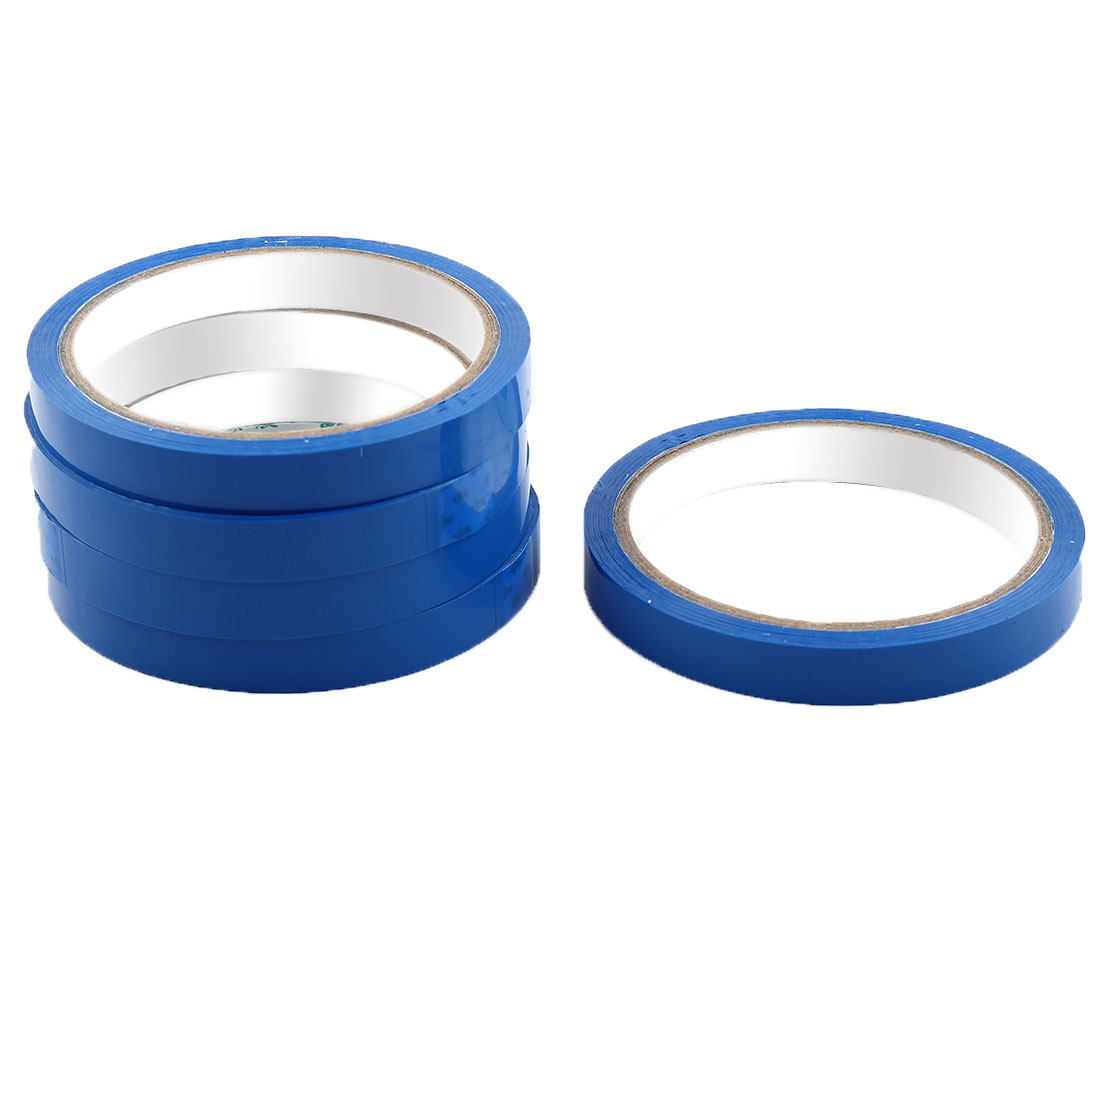 Supermarket PVC Vagetable Fruit Sealing Adhesive Tape Dark Blue 1.2cm Width 5pcs